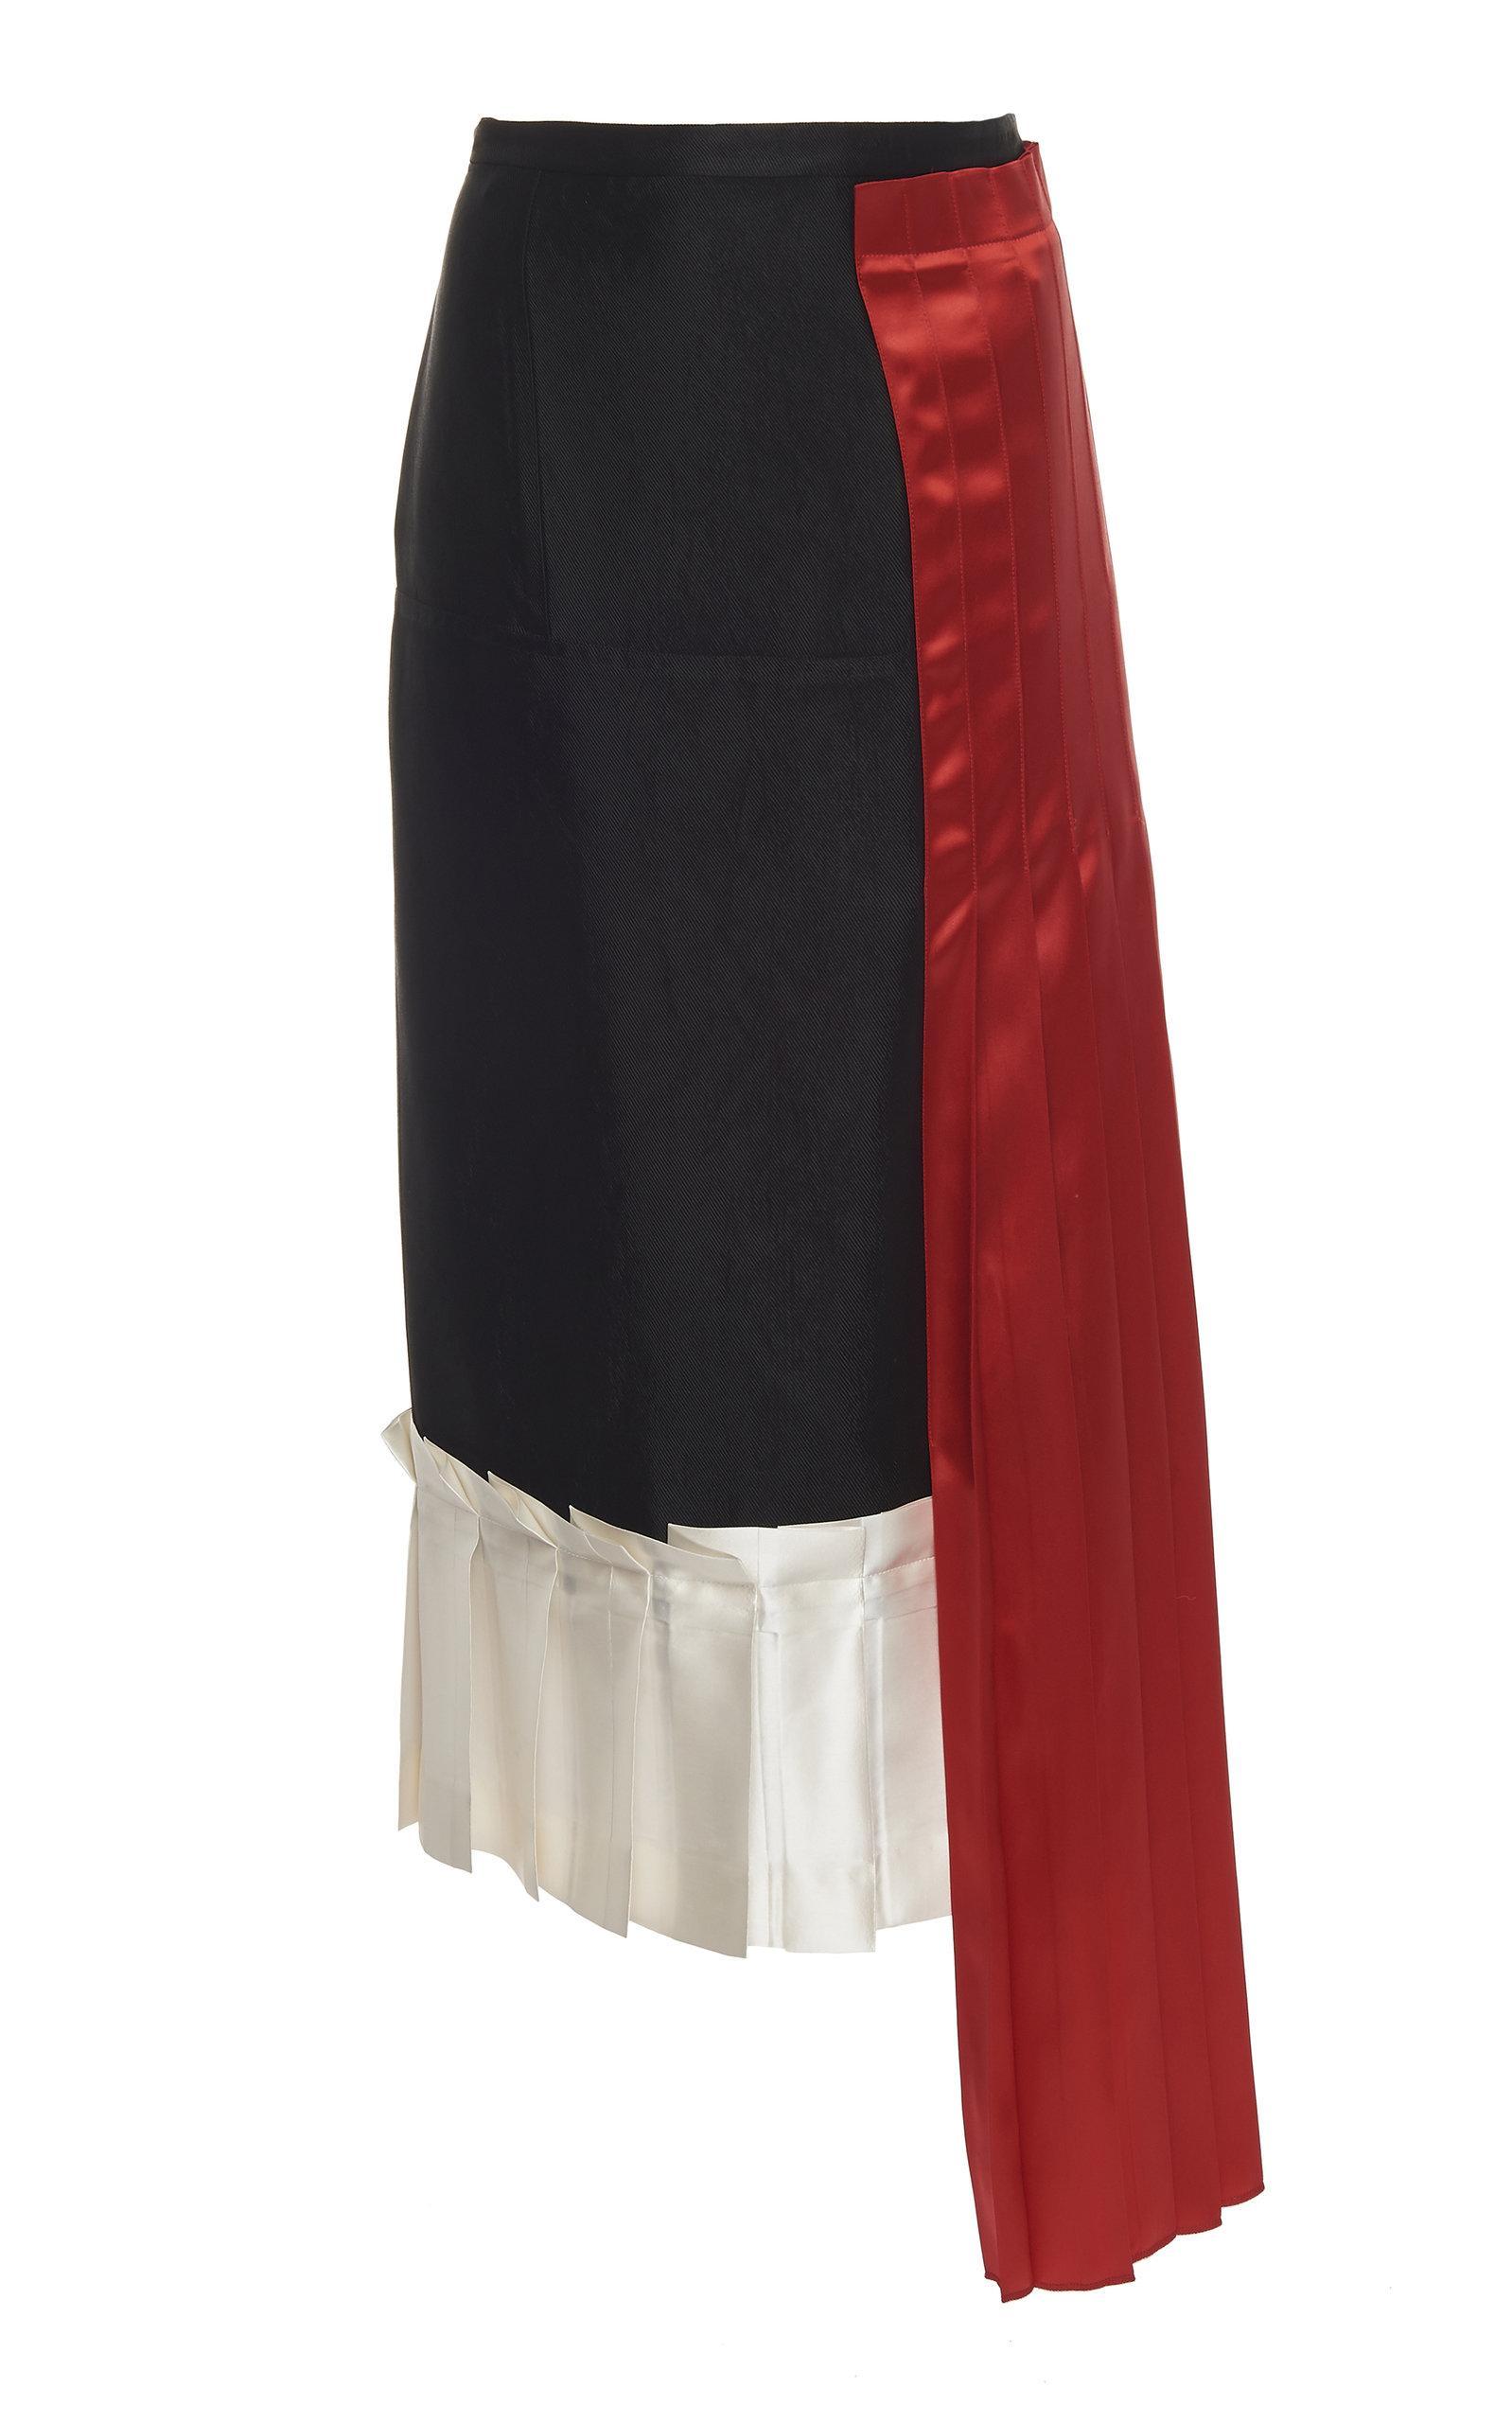 52a642ab93 Lyst - Marni Draped Satin Pleated Skirt in Black